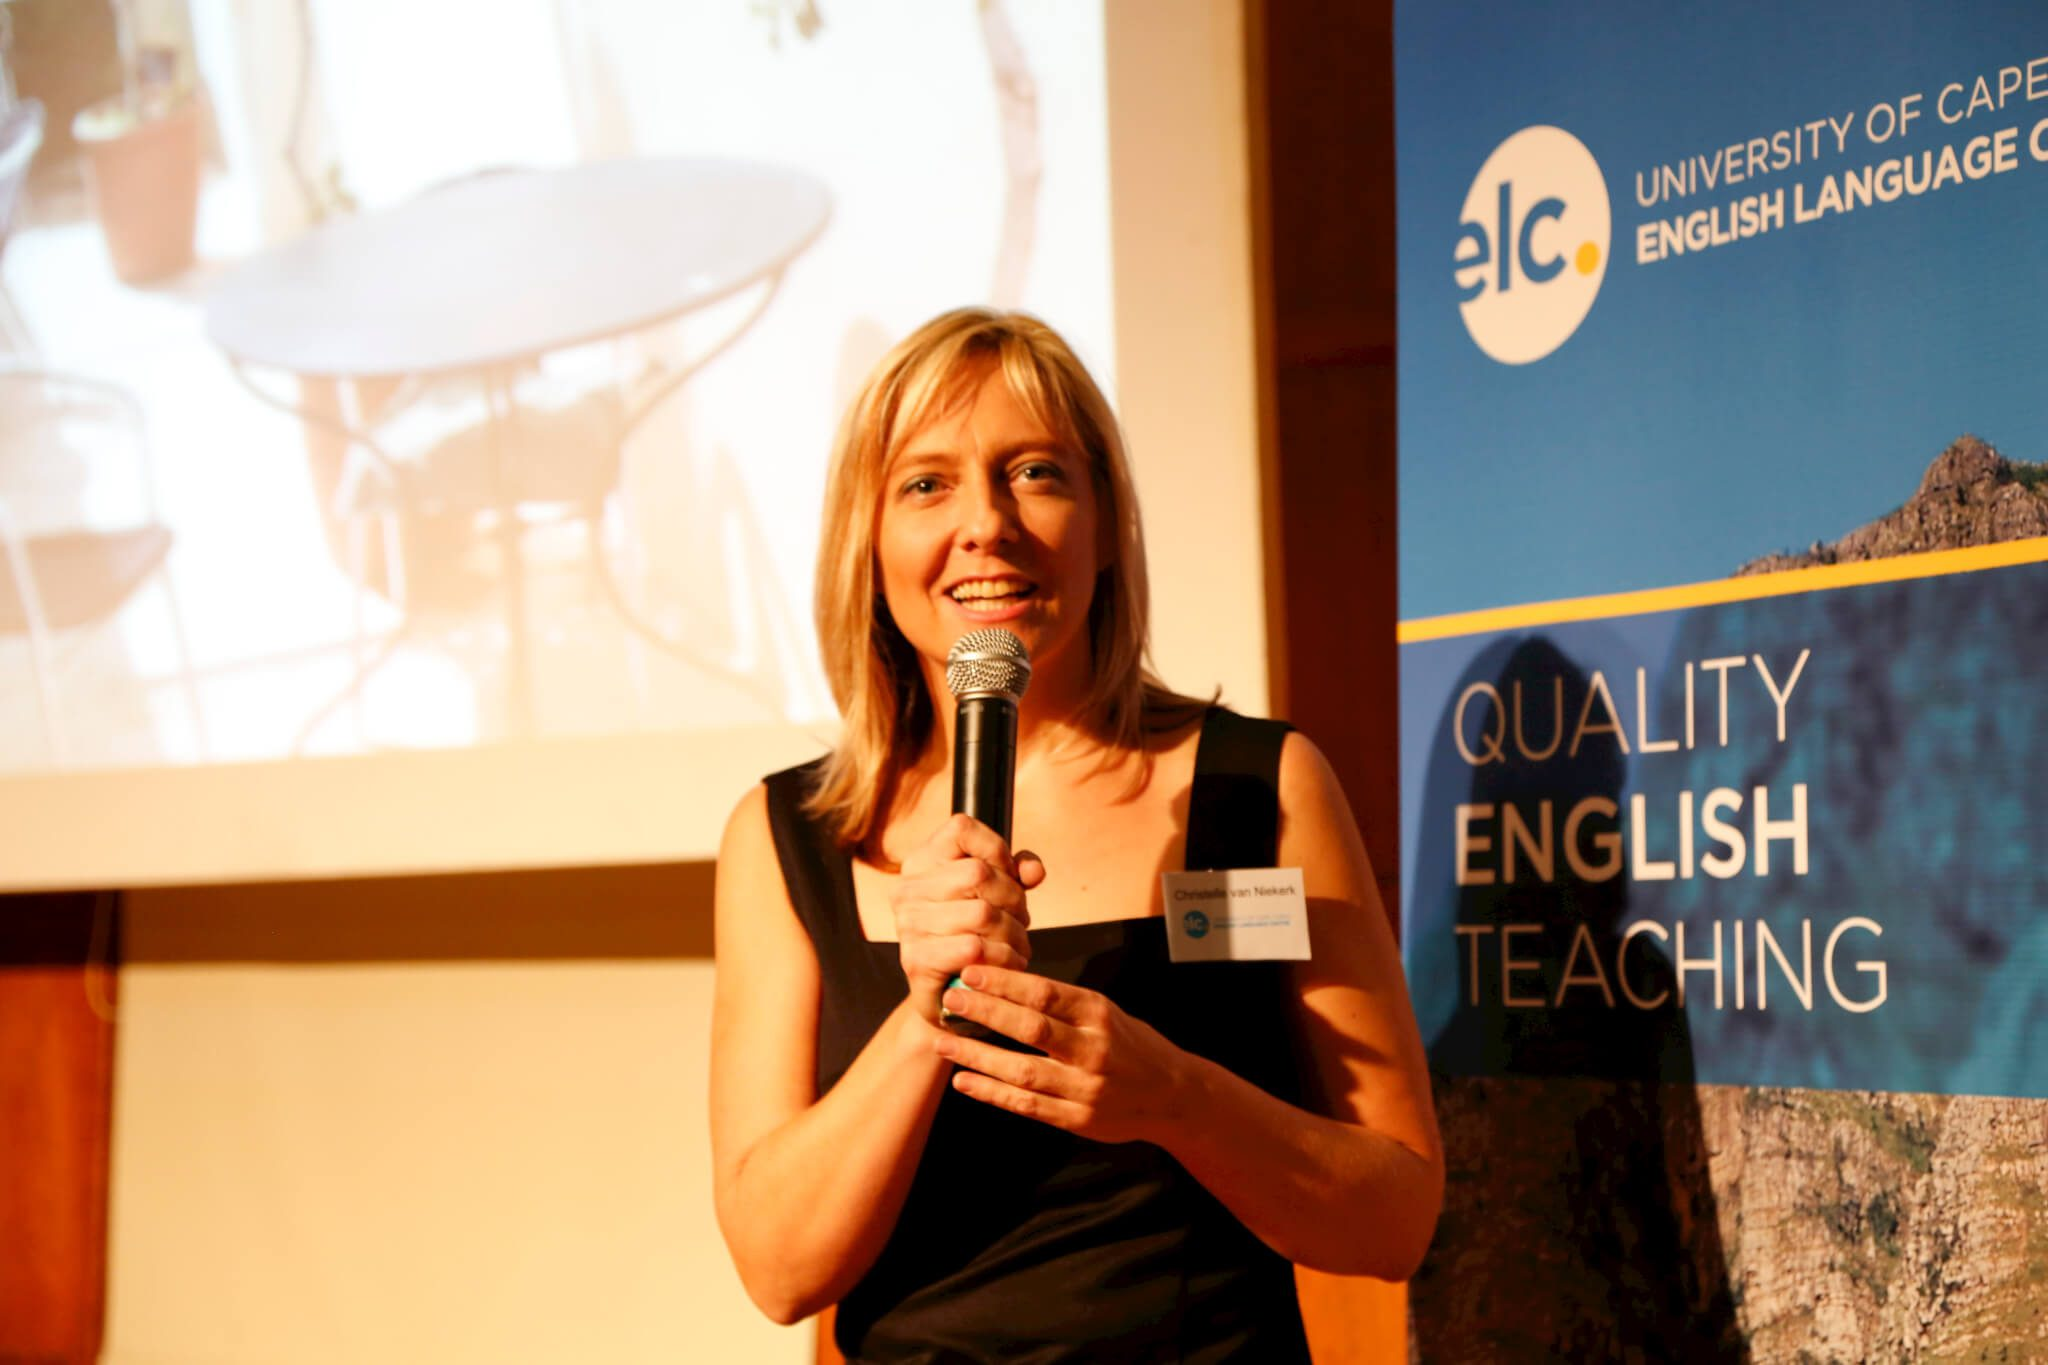 Teacher and MC, Christelle Van Niekerk